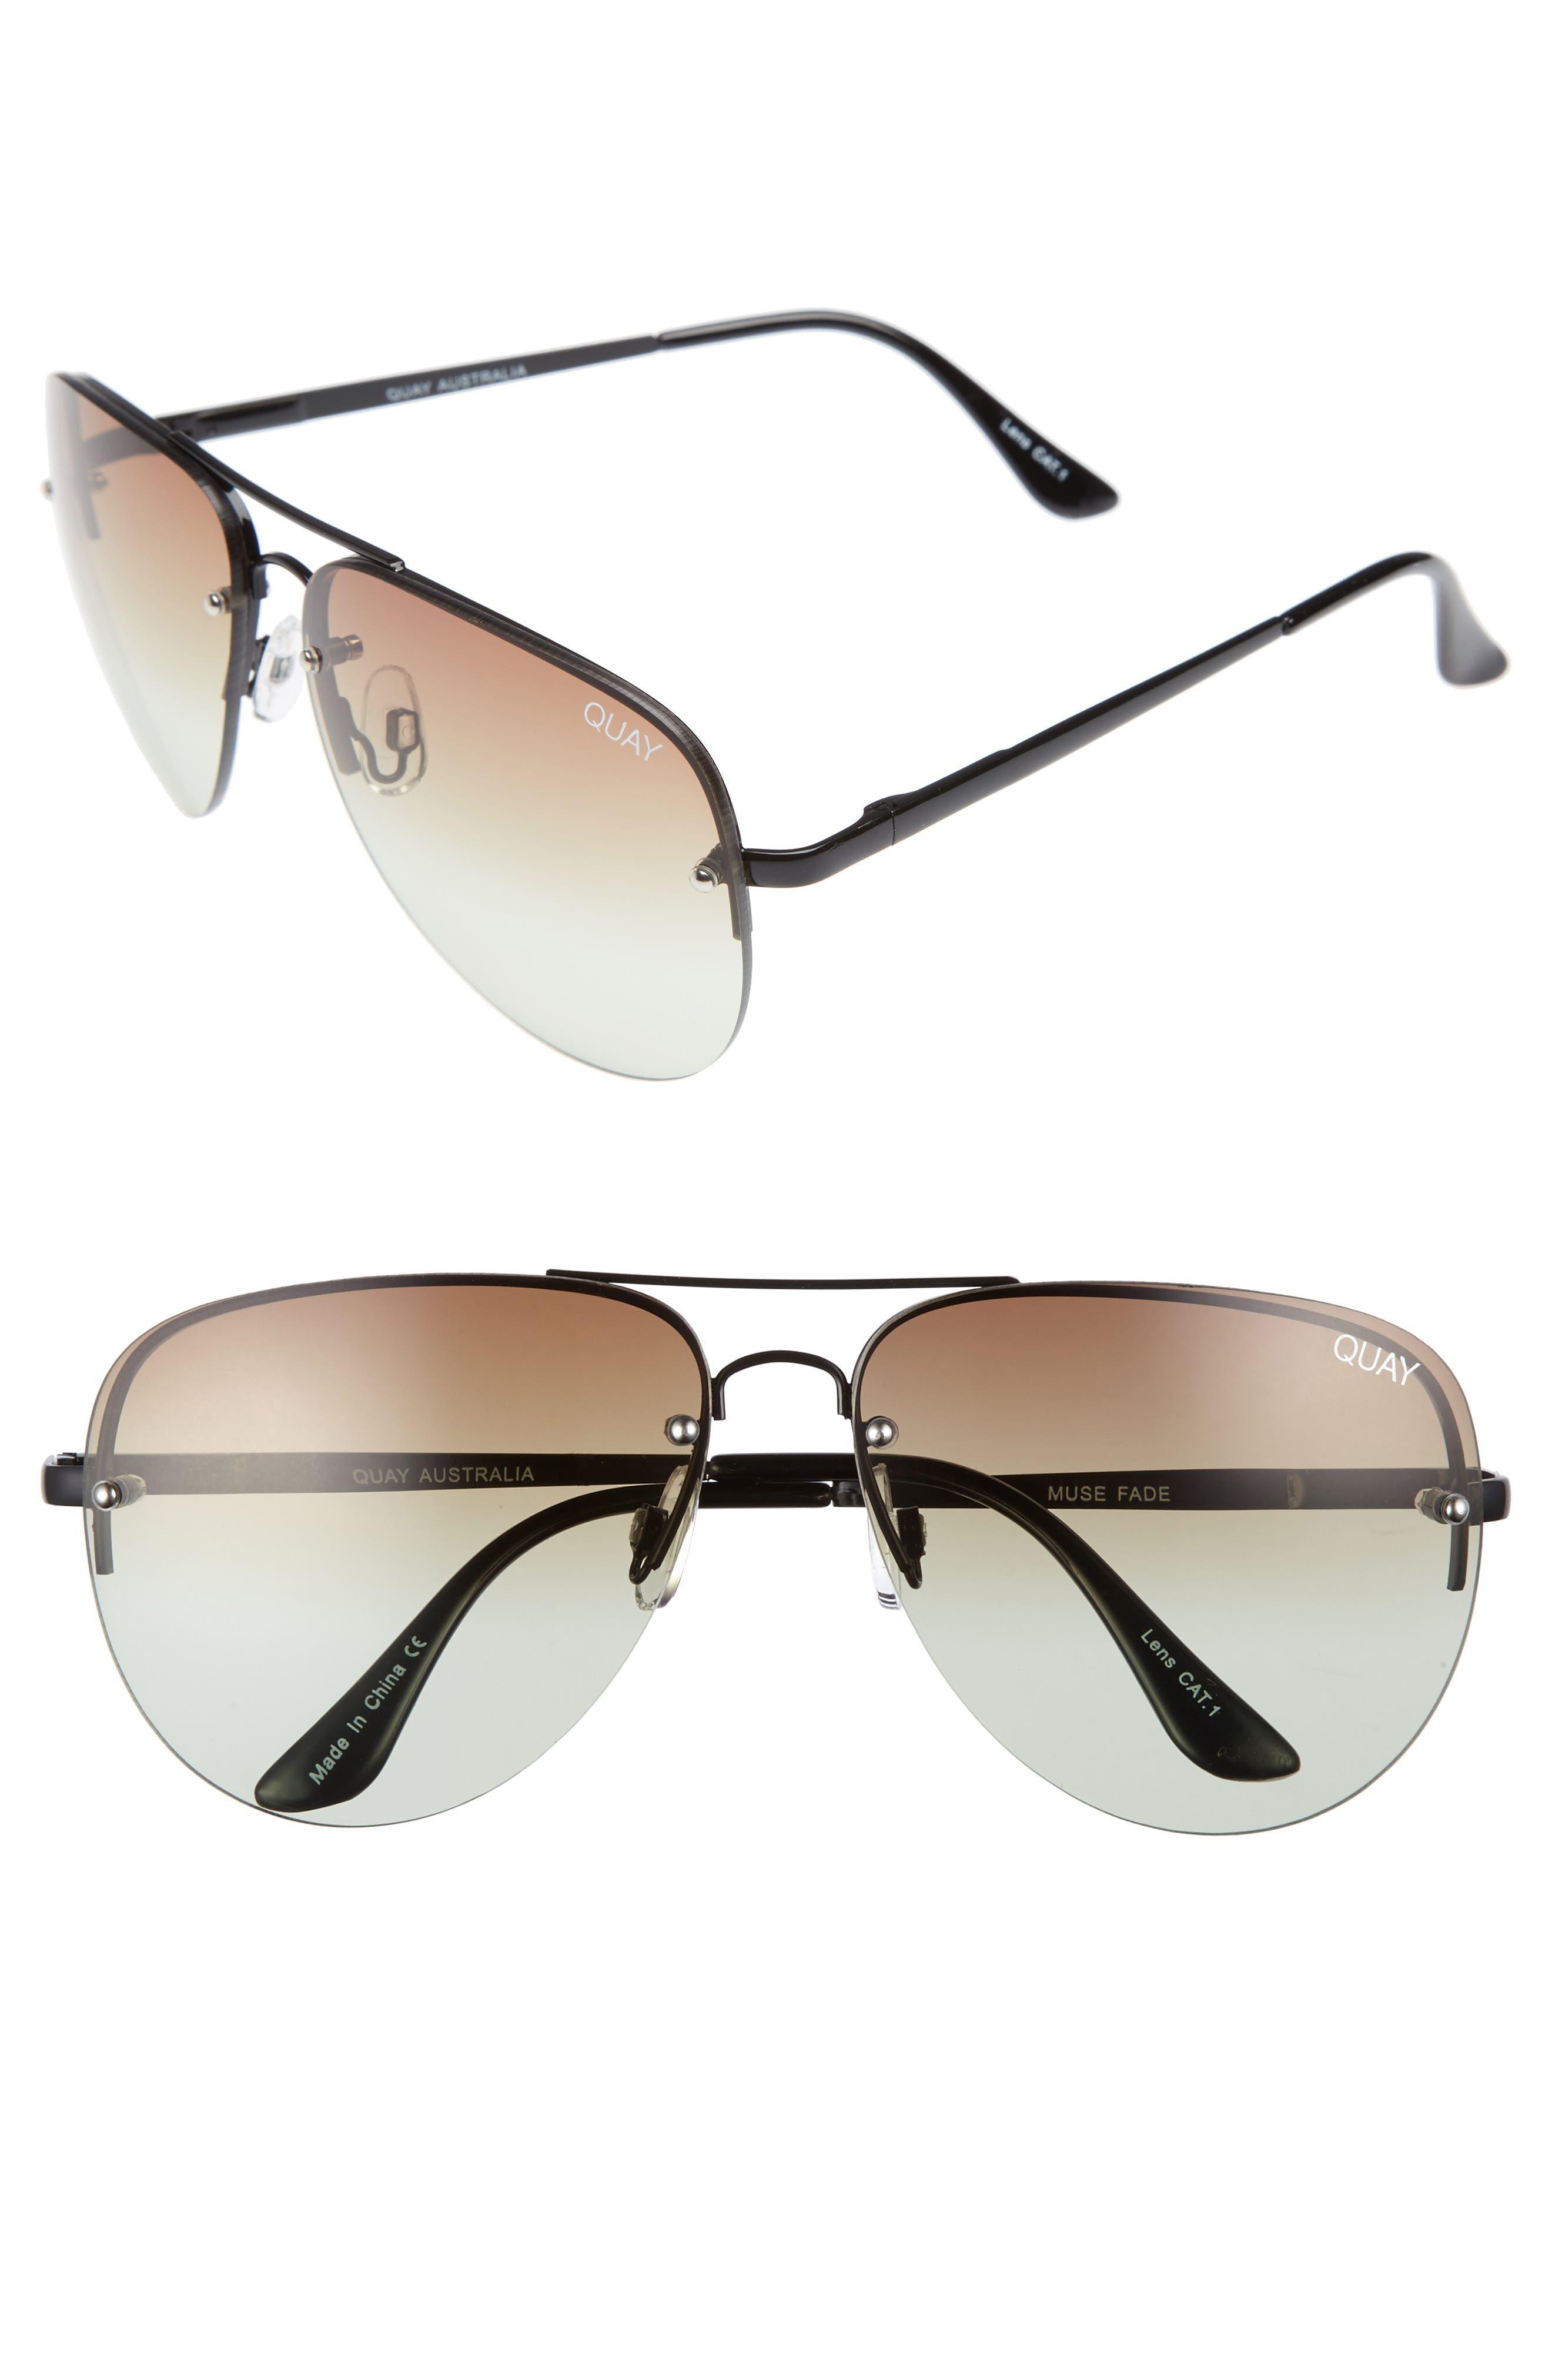 Quay Australia Muse Fade 62mm Aviator Sunglasses